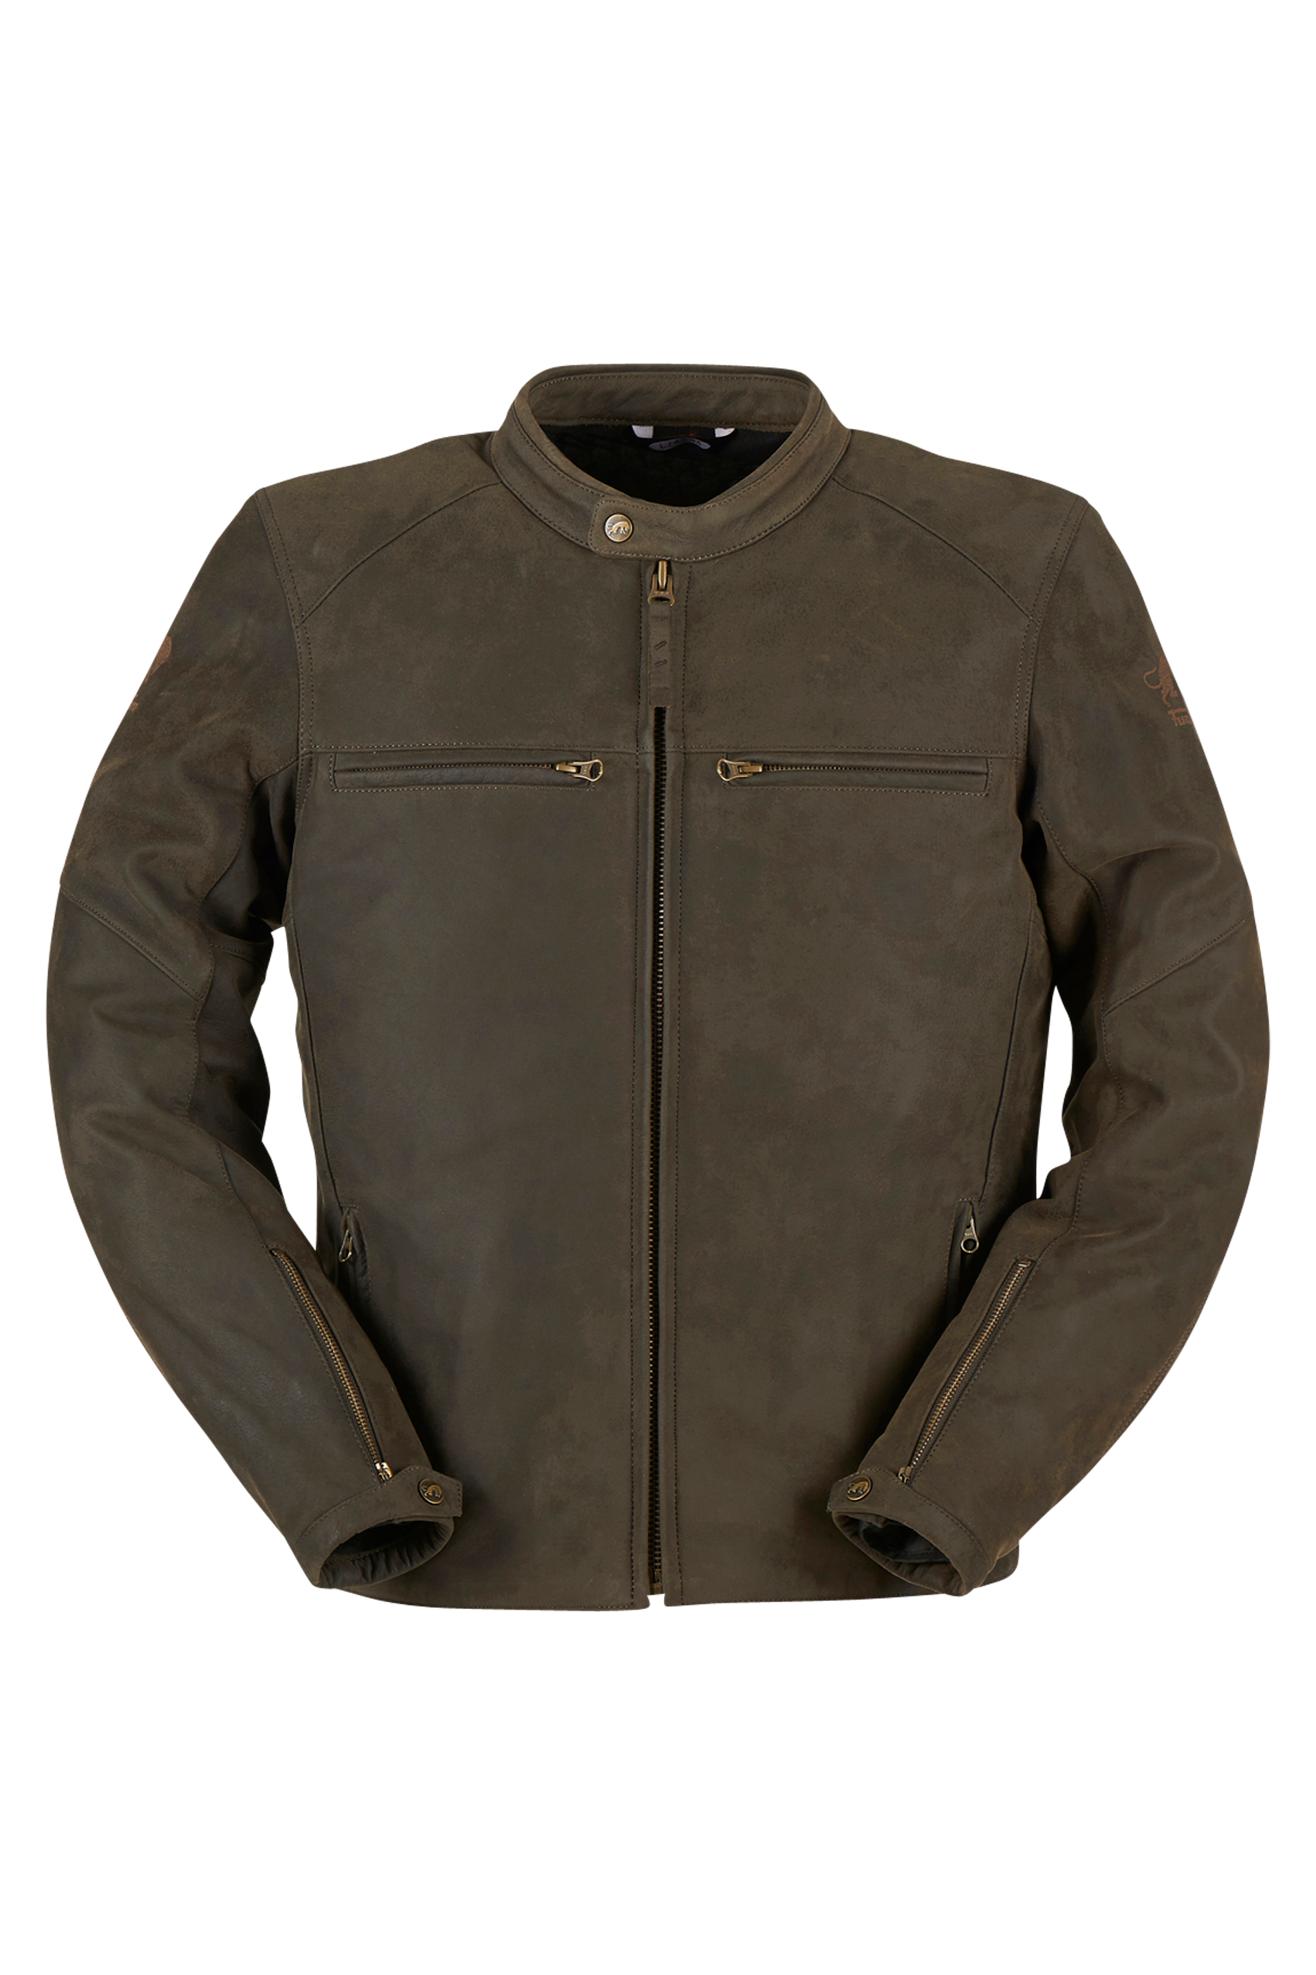 furygan giacca moto  vince v3 marrone